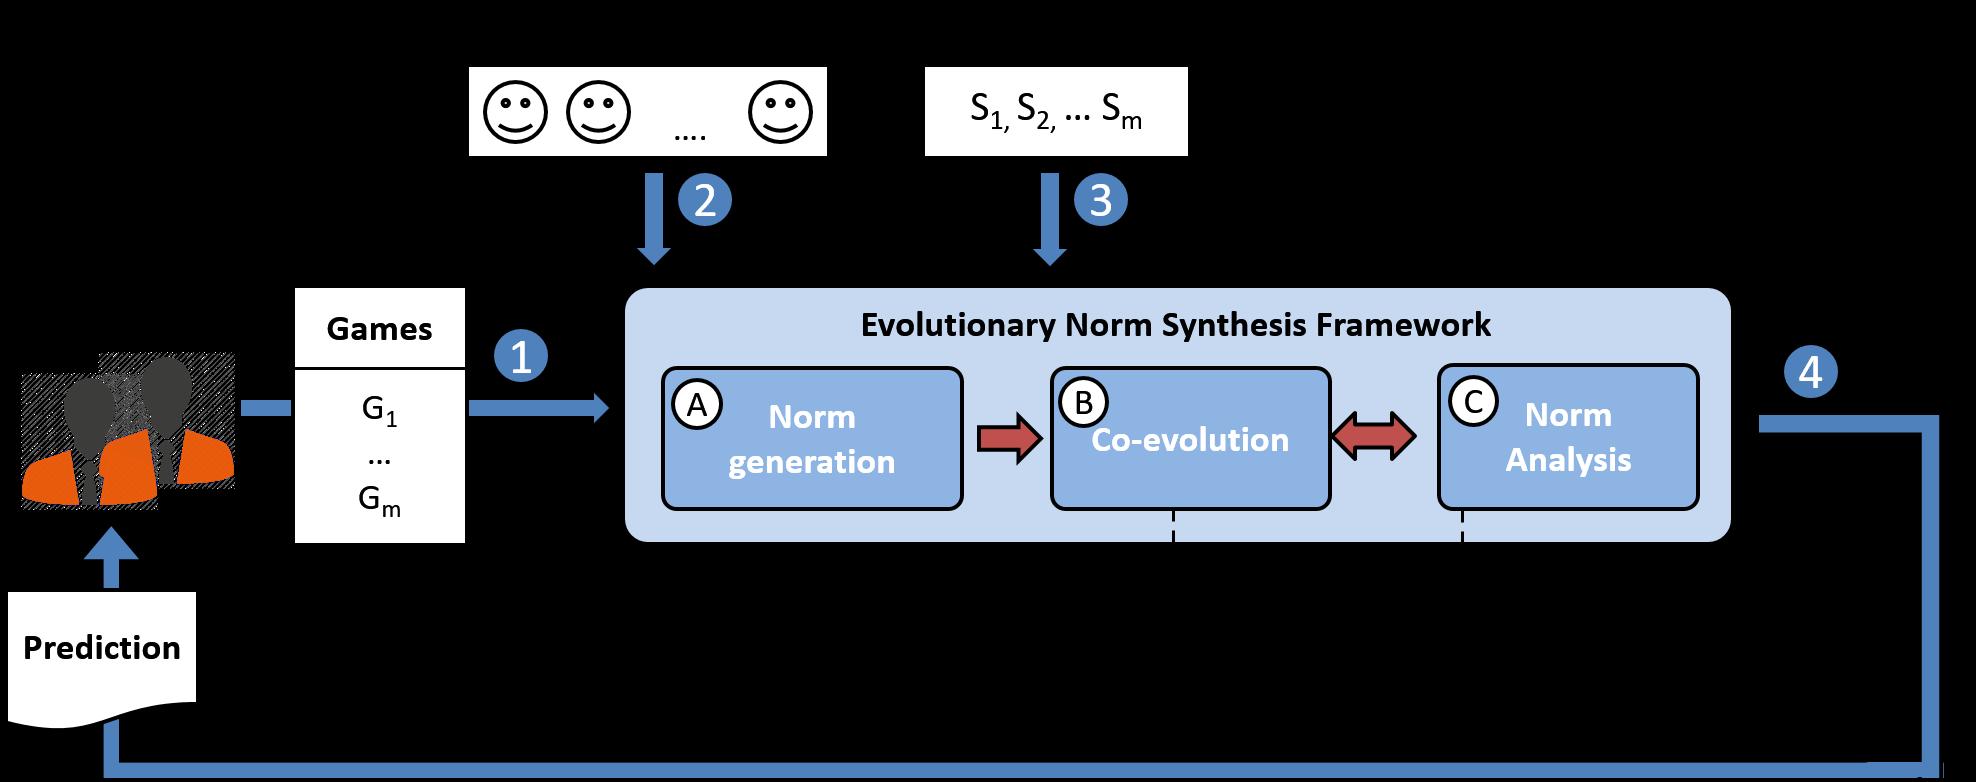 SENSE's architecture and computational model